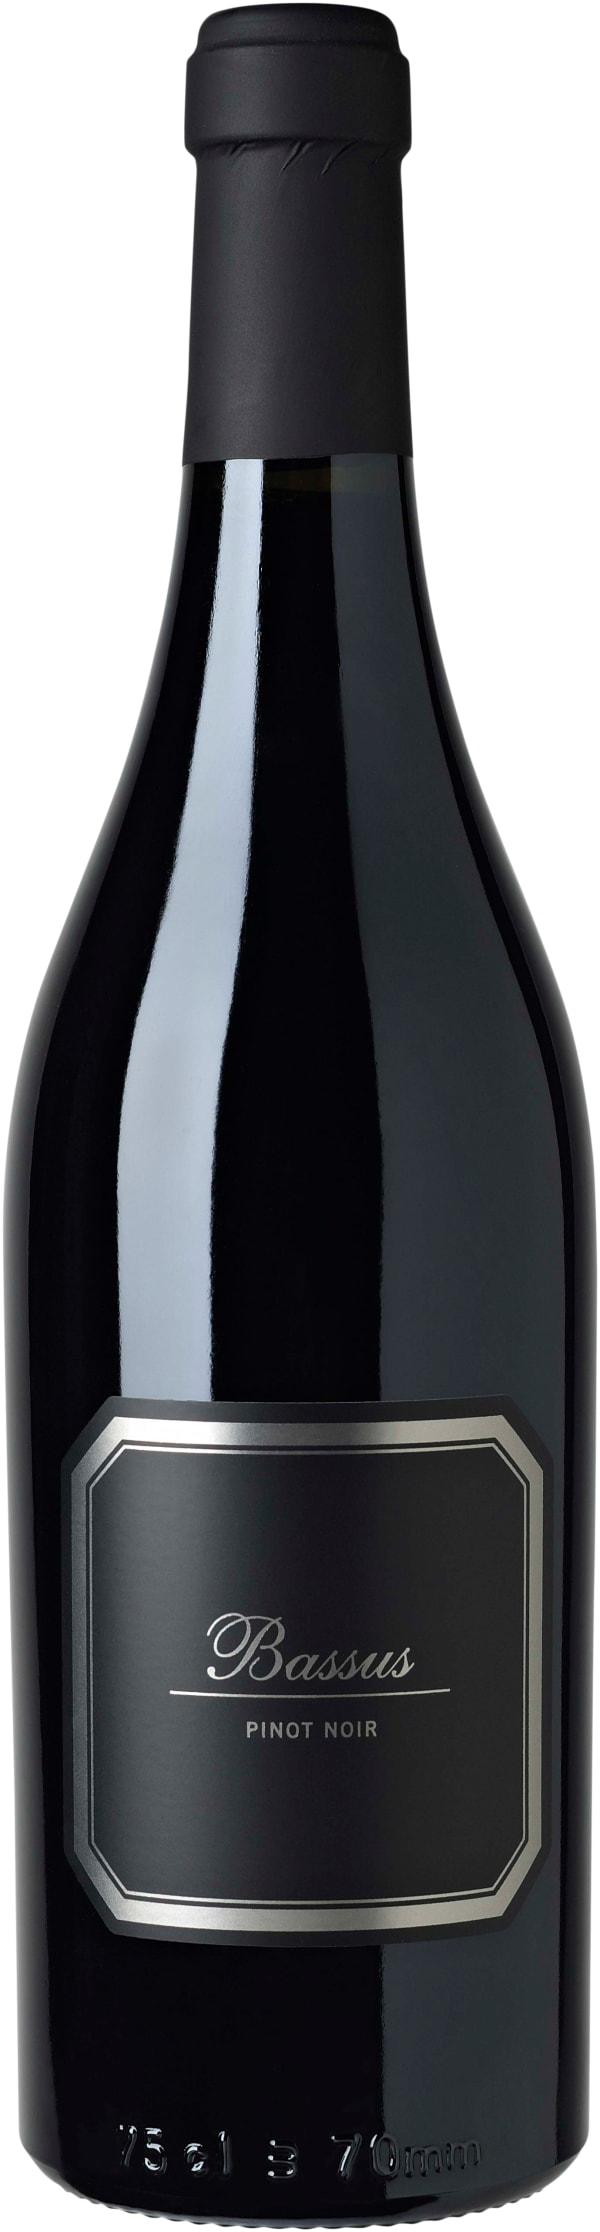 Hispano+Suizas Bassus Pinot Noir 2017